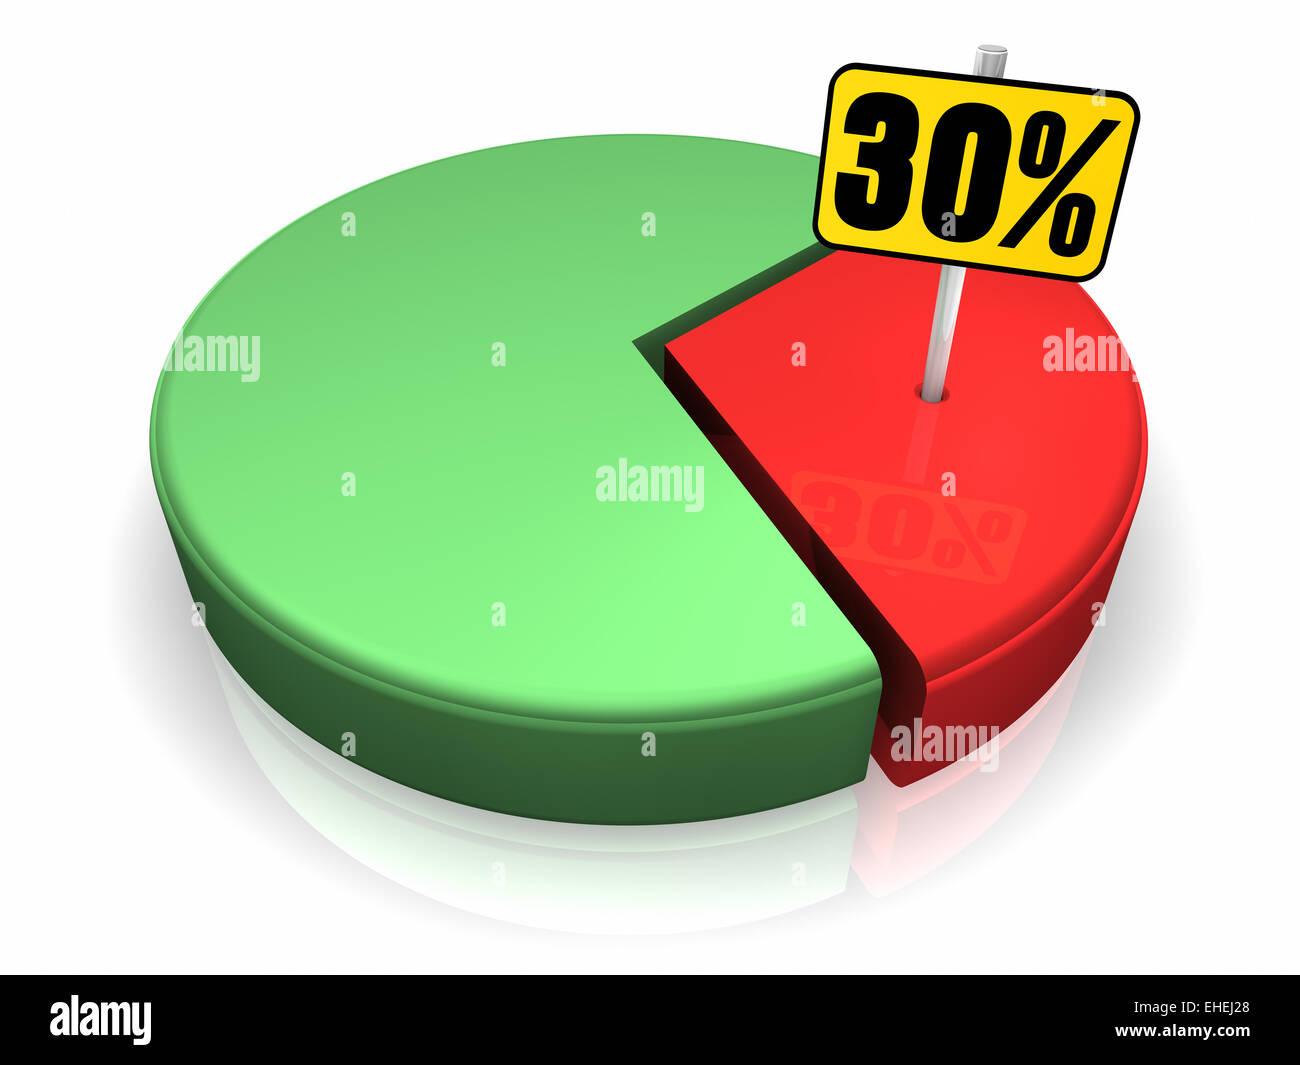 Pie chart 30 percent stock photo royalty free image 79612128 alamy pie chart 30 percent nvjuhfo Choice Image